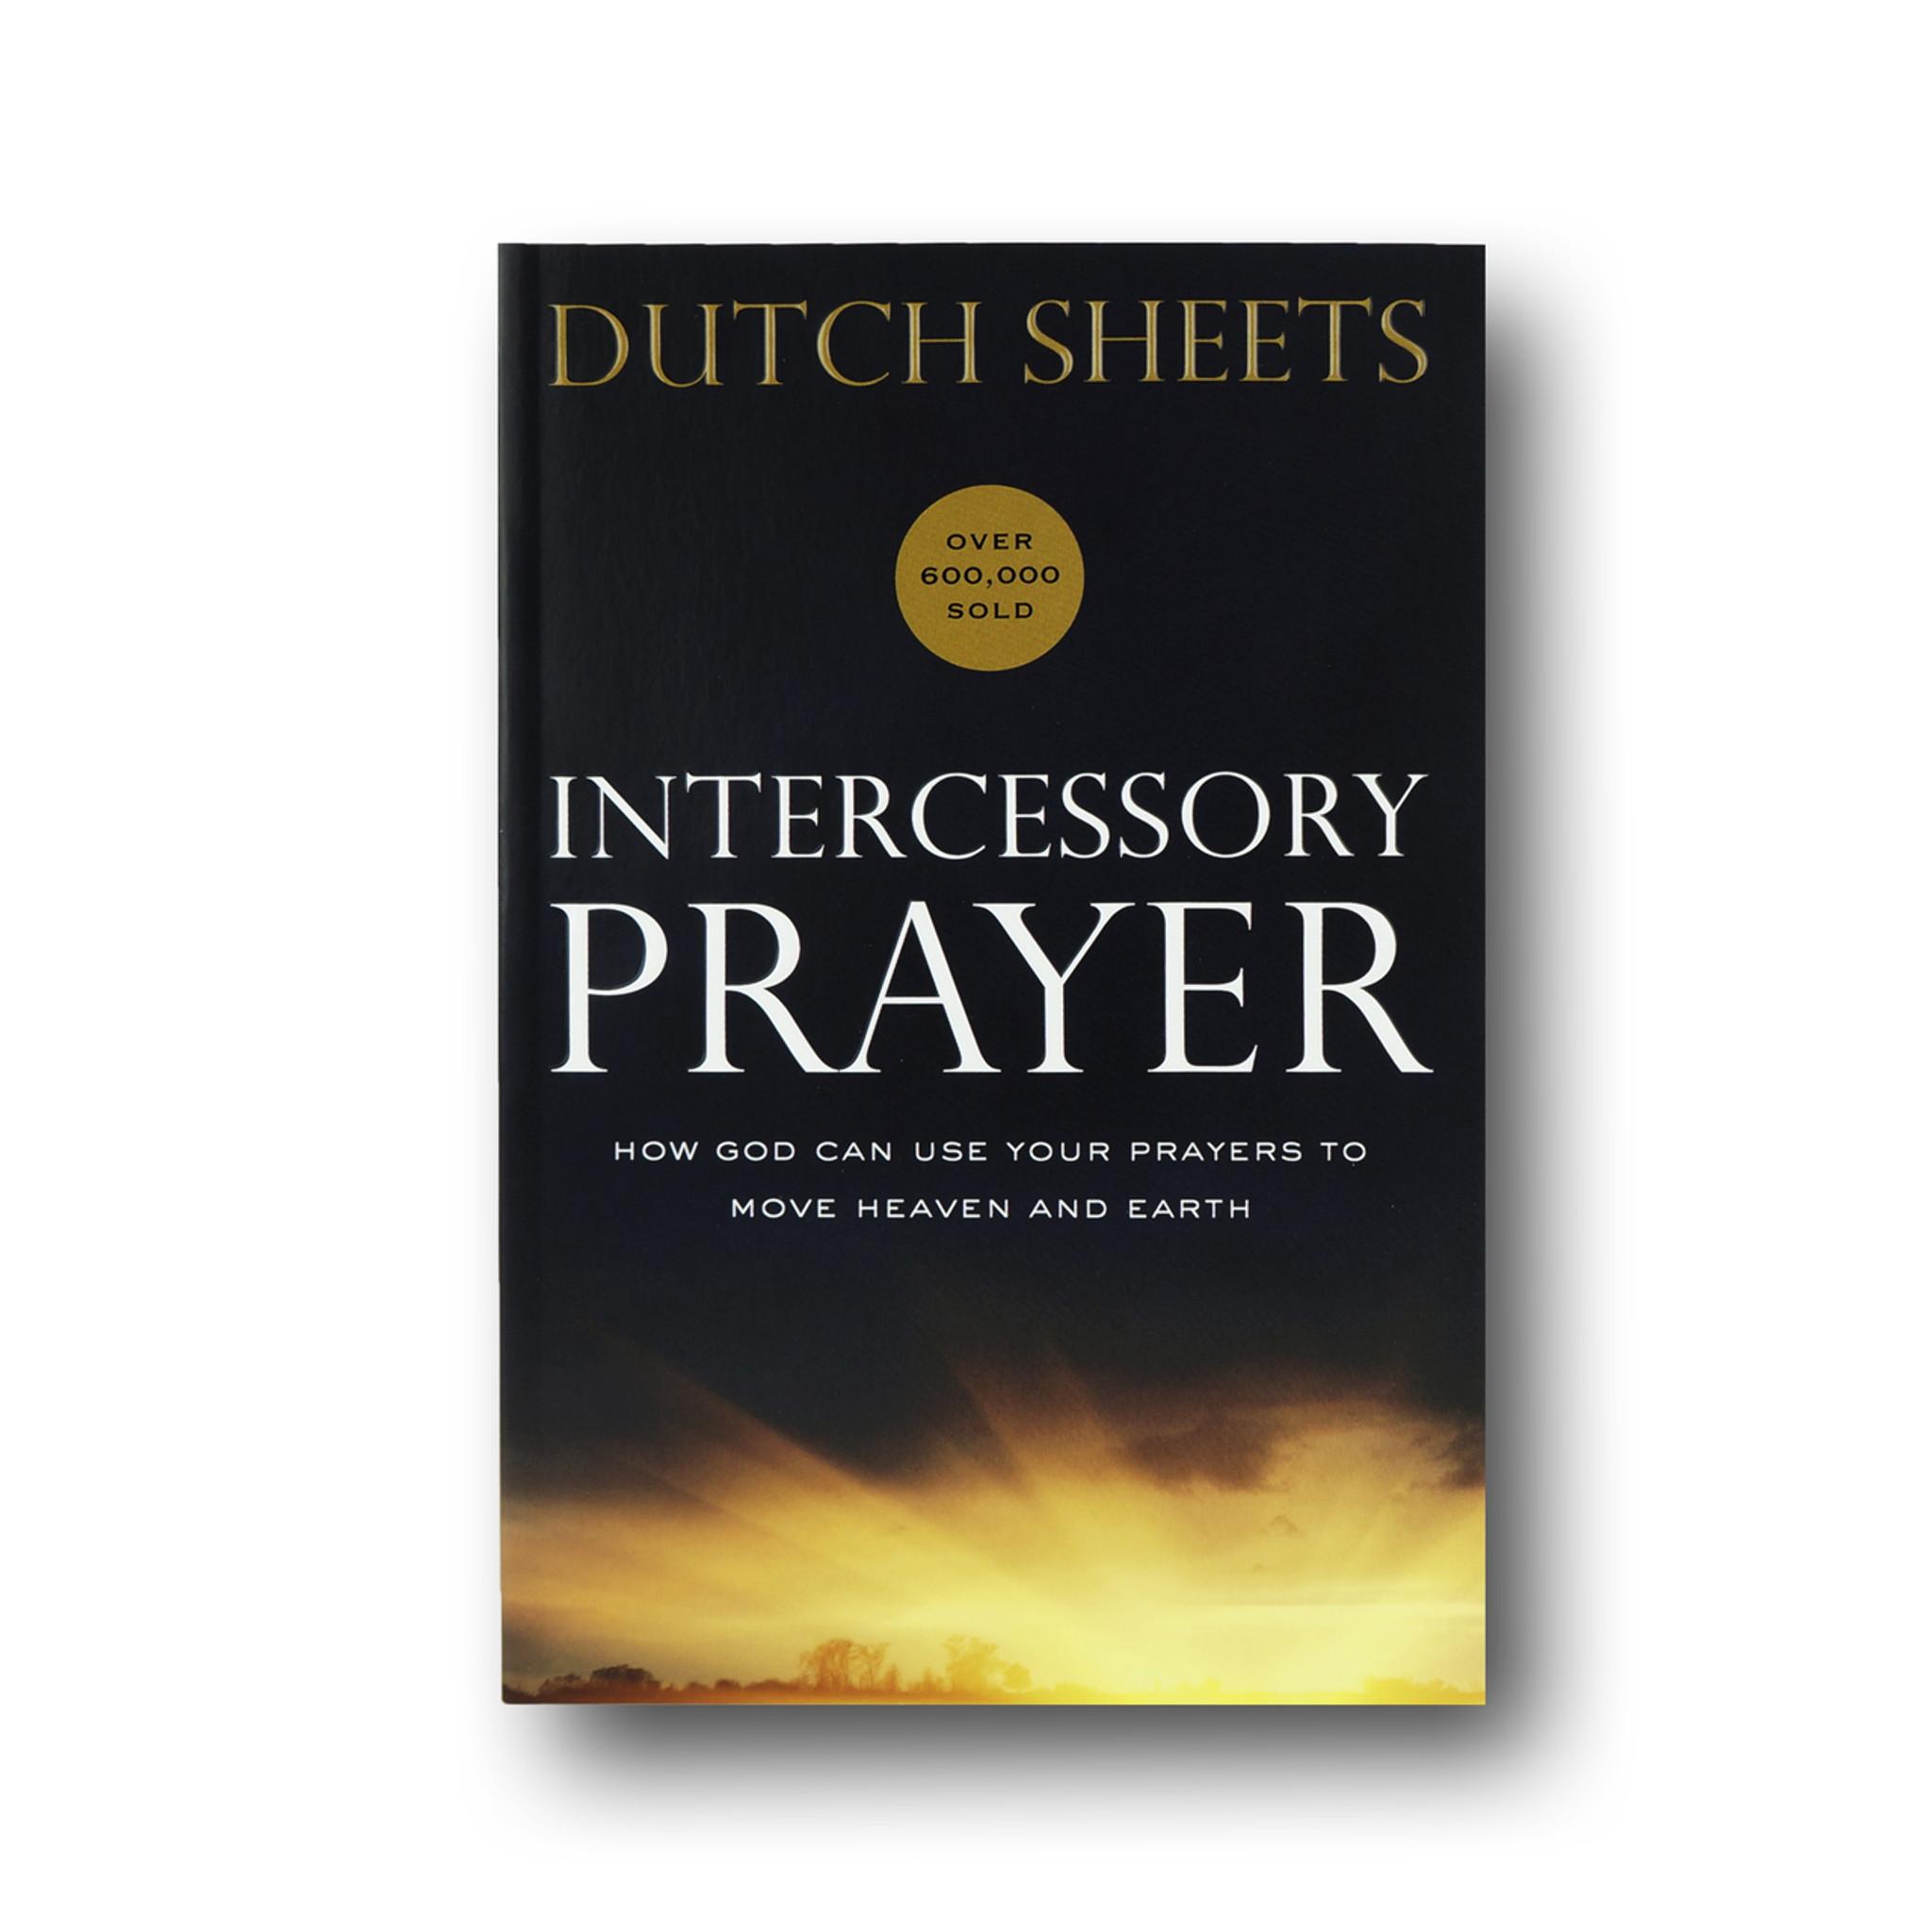 Workbooks prayer workbook : Intercessory Prayer: How God Can Use Your Prayers to Move Heaven ...